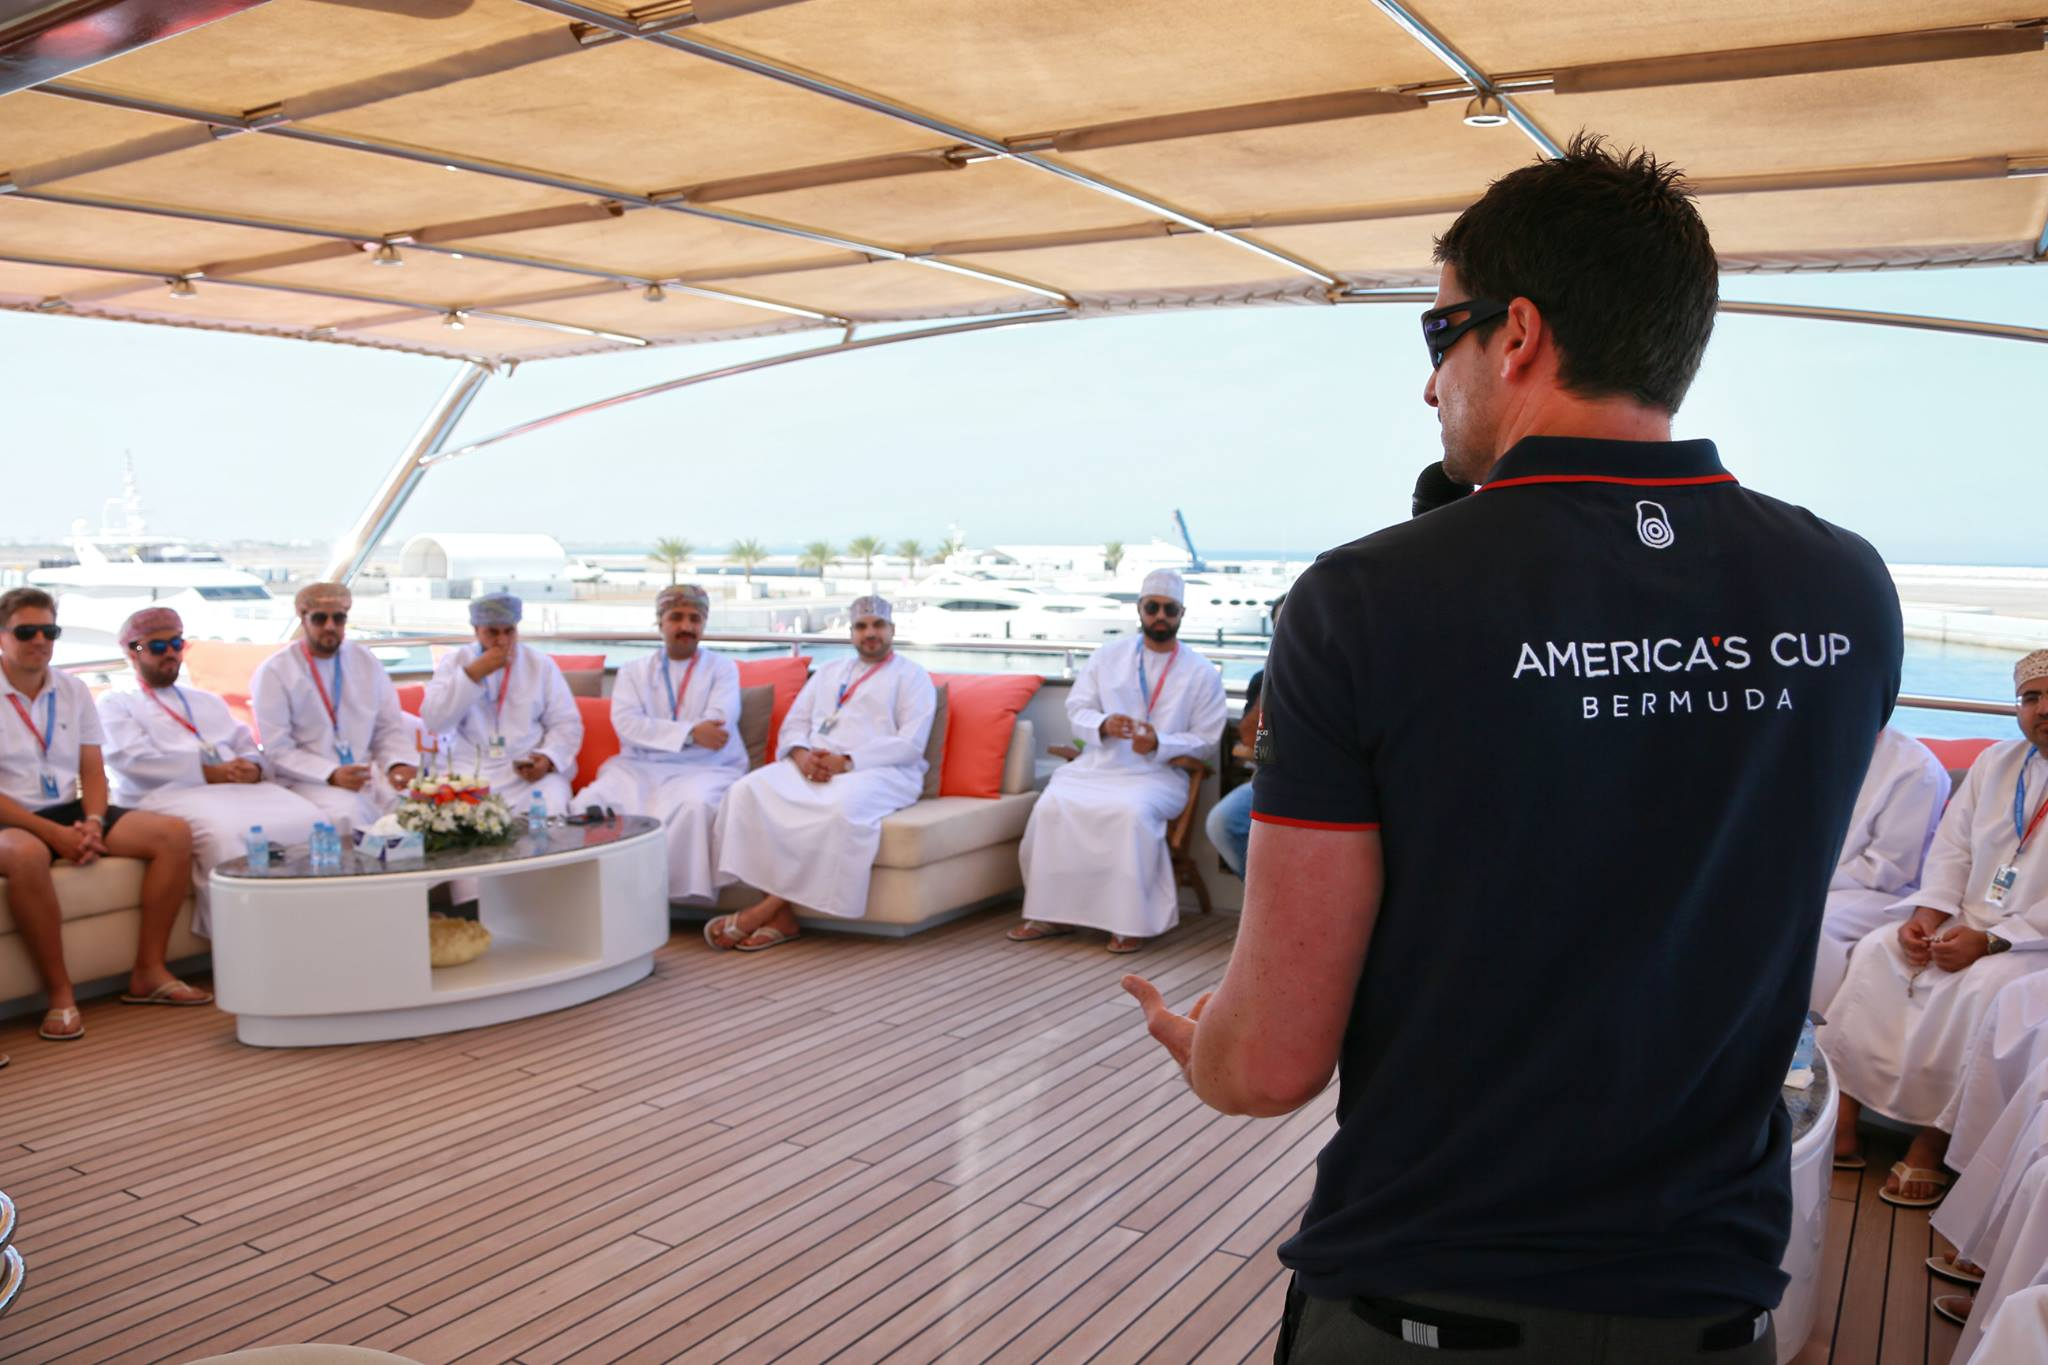 Americas Cup World Series Oman